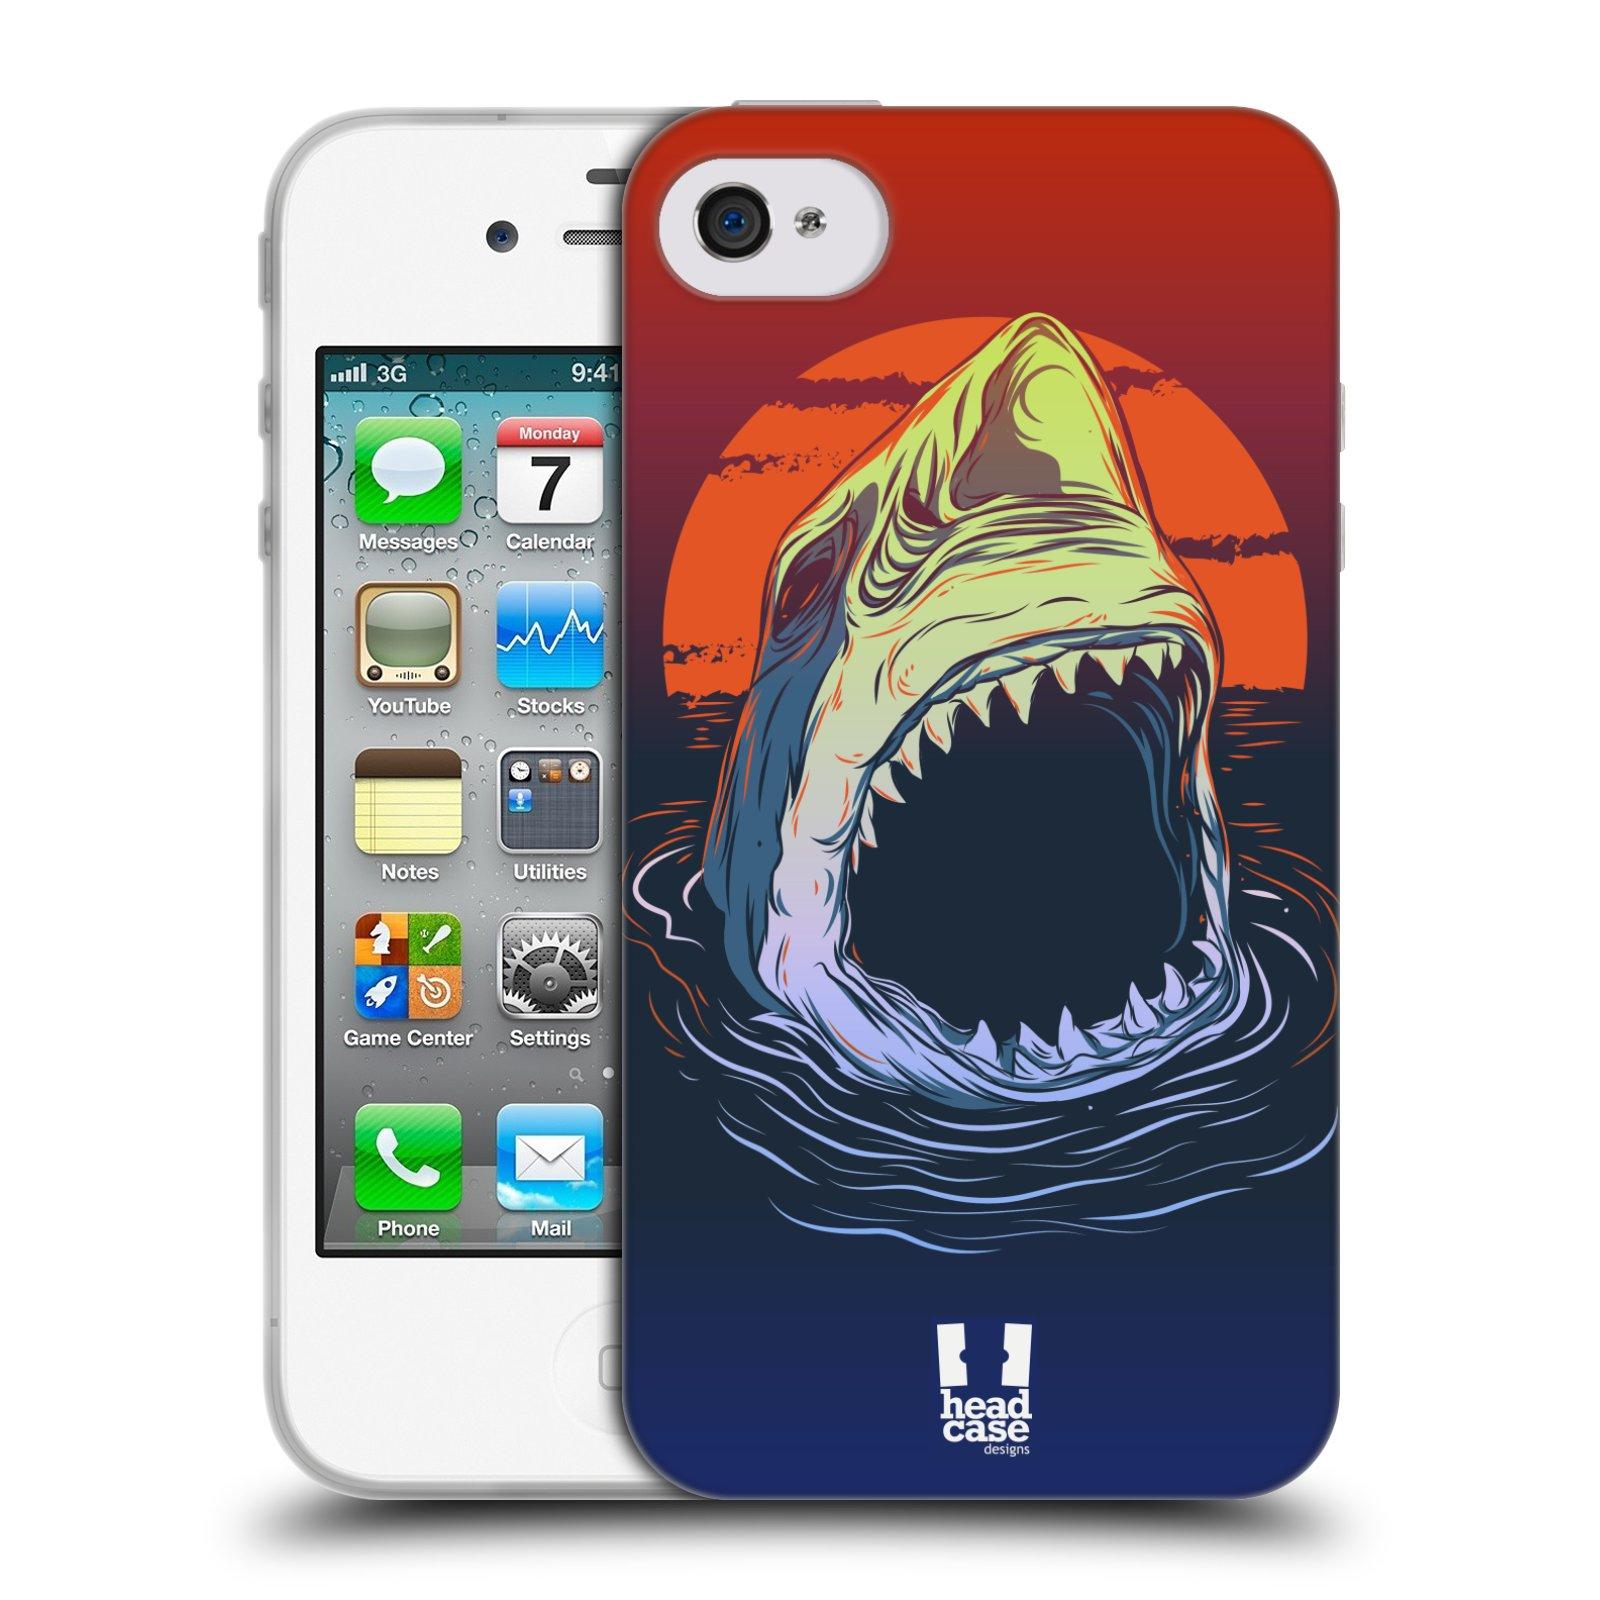 HEAD CASE silikonový obal na mobil Apple Iphone 4/4S vzor mořská monstra žralok